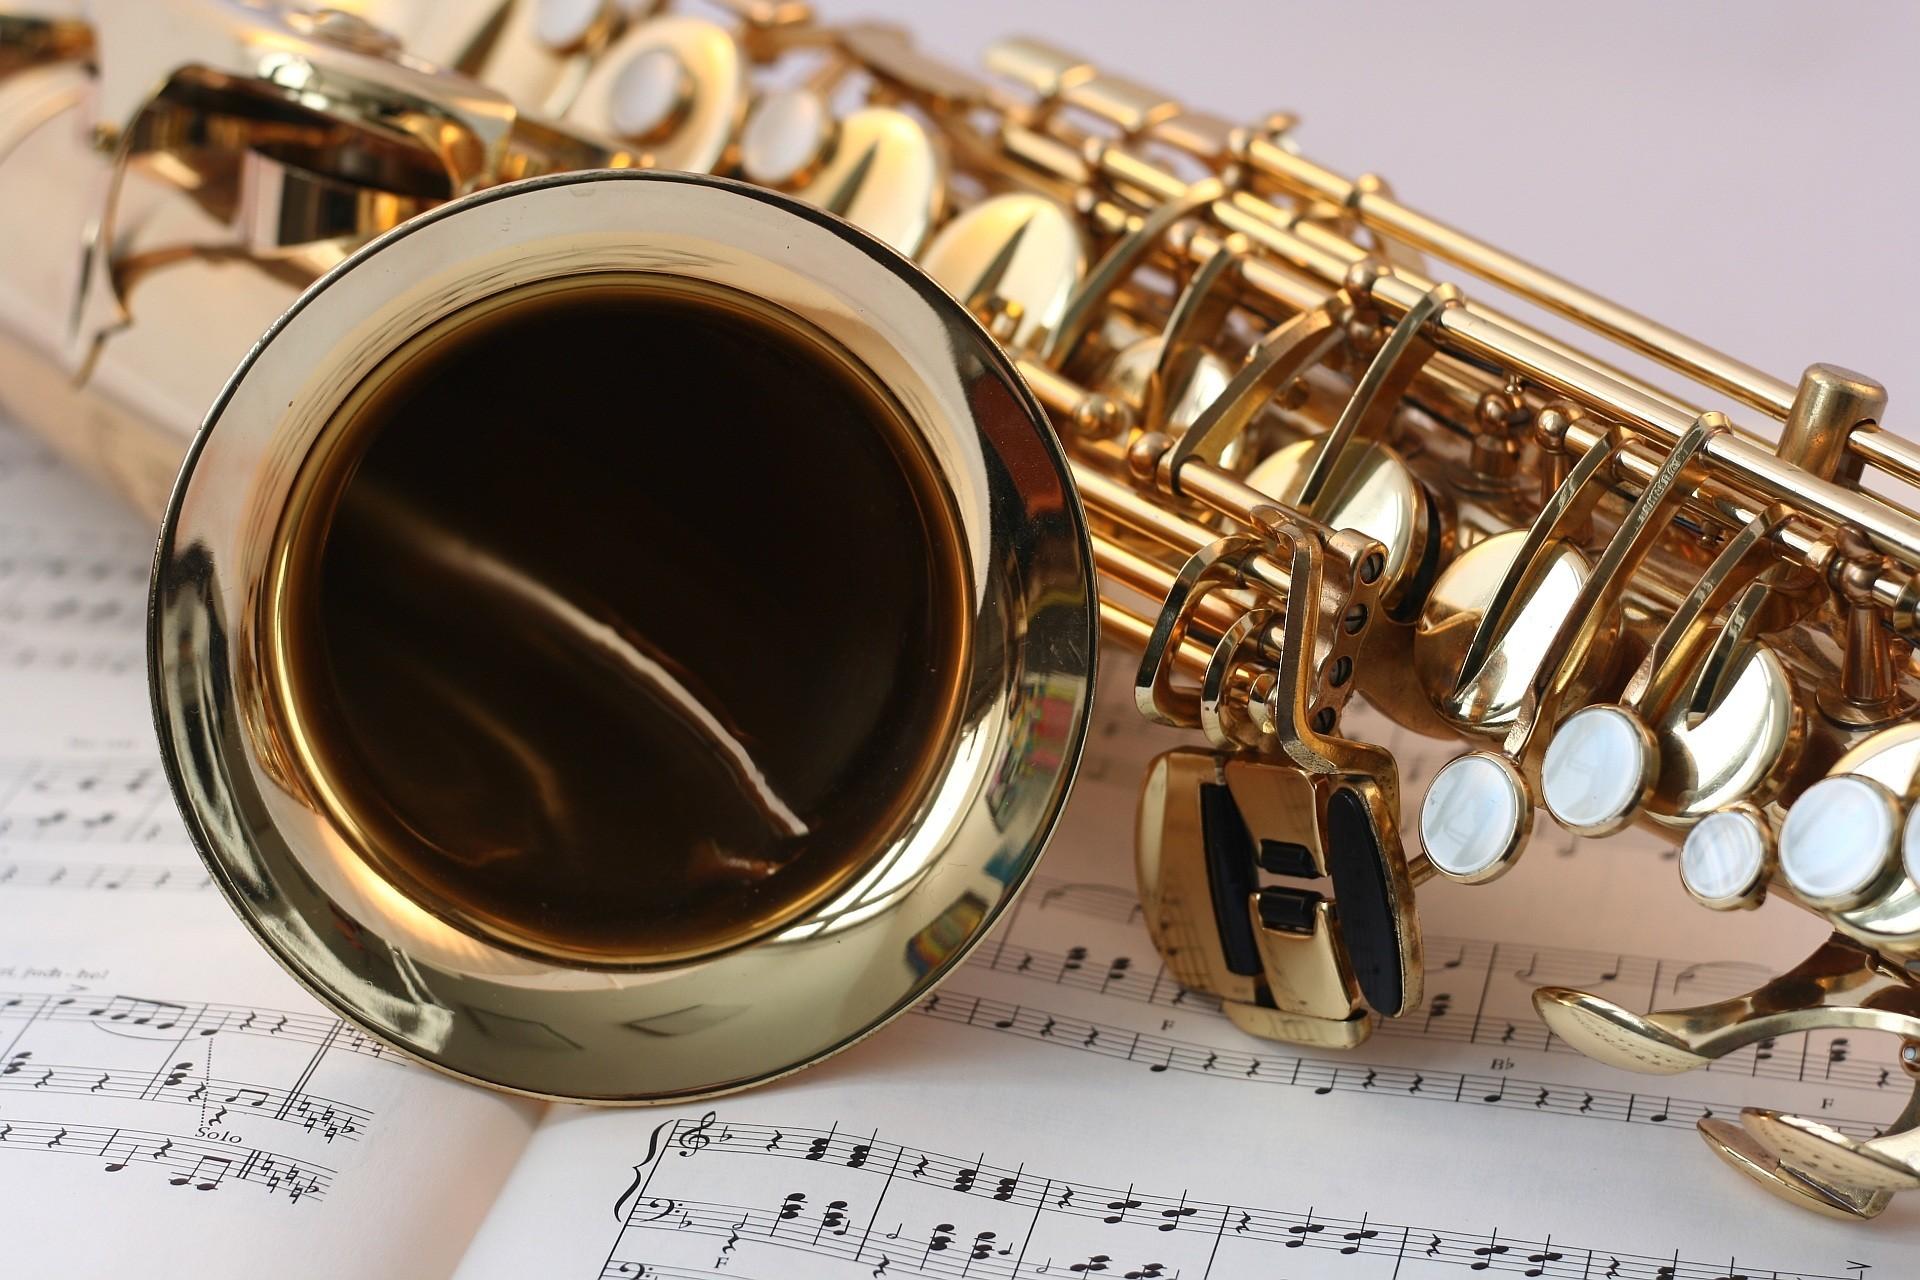 Free stock photo of music, reflection, keys, classic